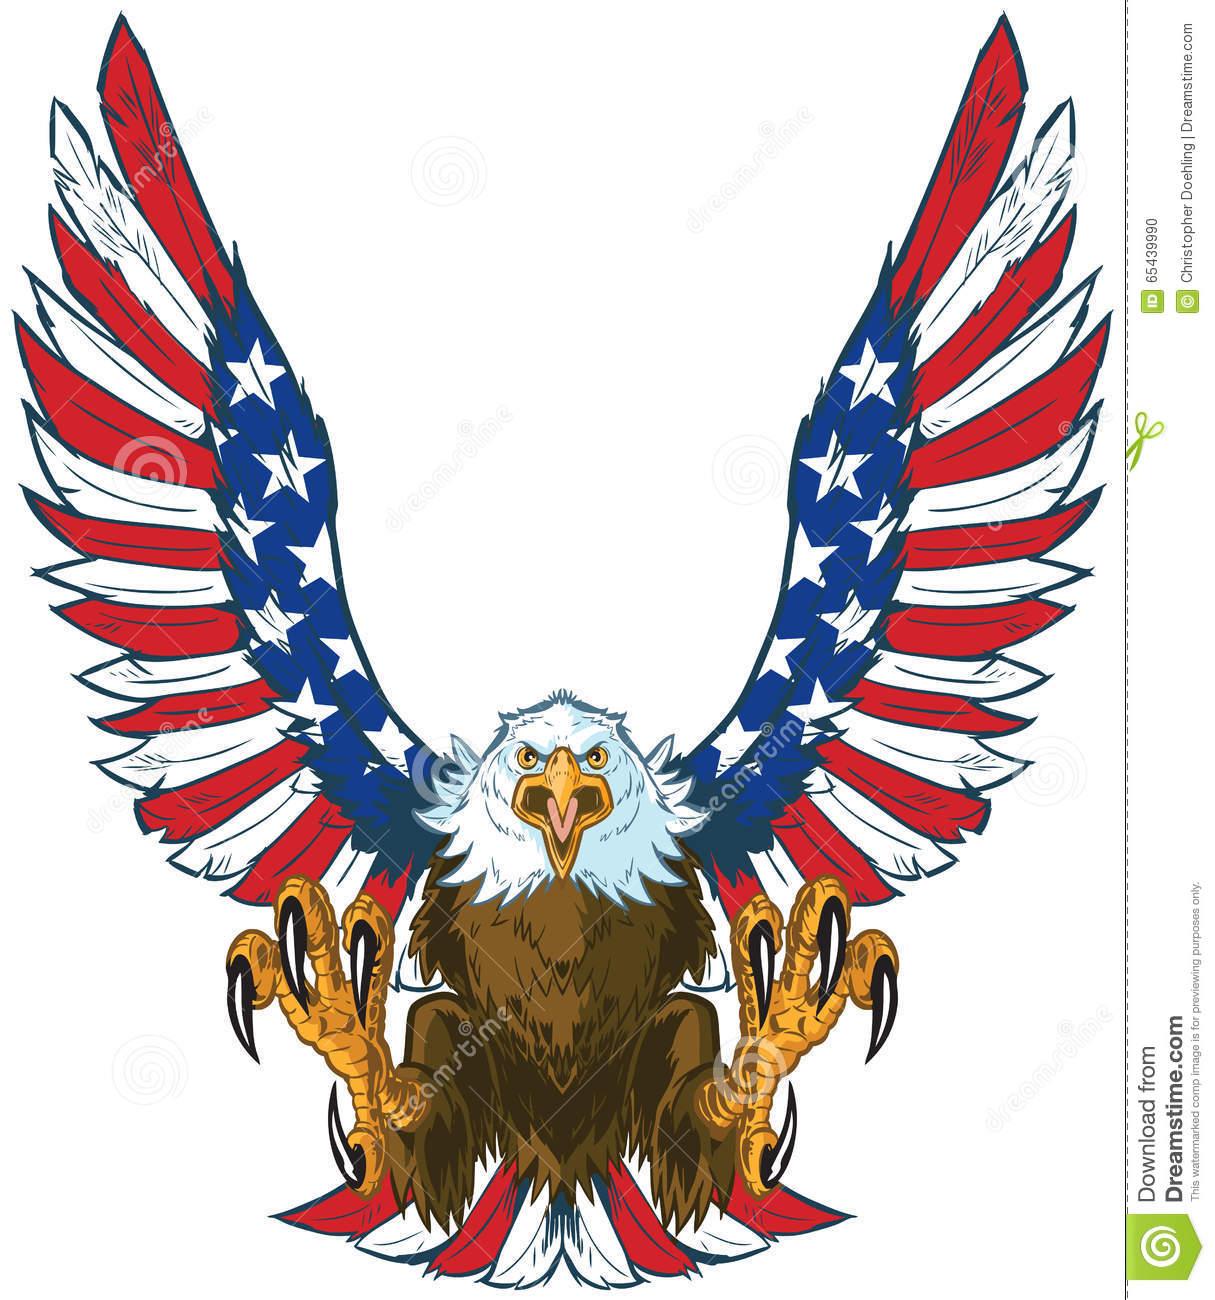 America clipart american eagle American Wings Art Flag